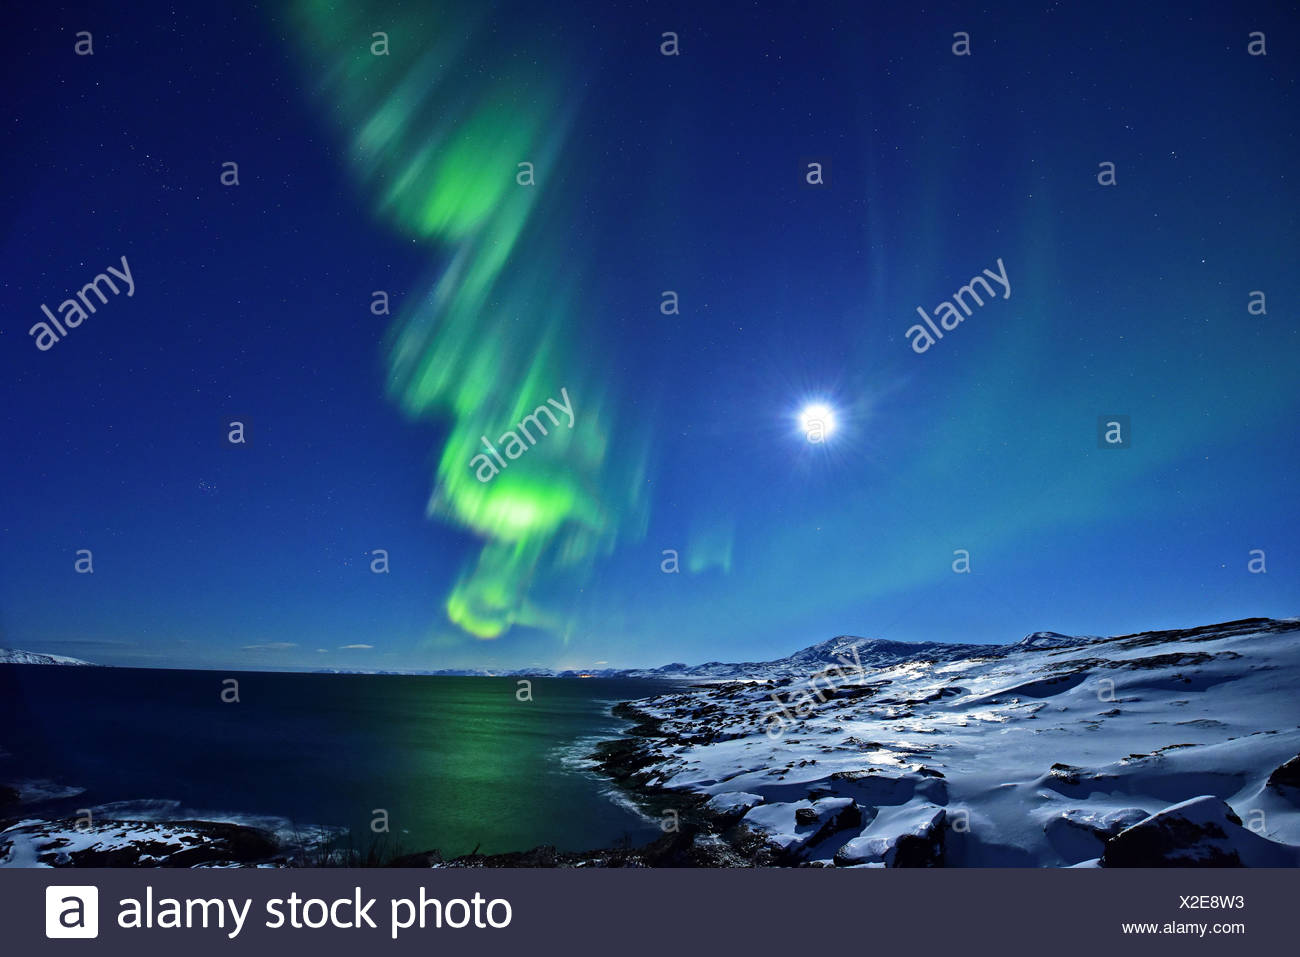 Nordlicht nähe Lillefjord - Stock Image